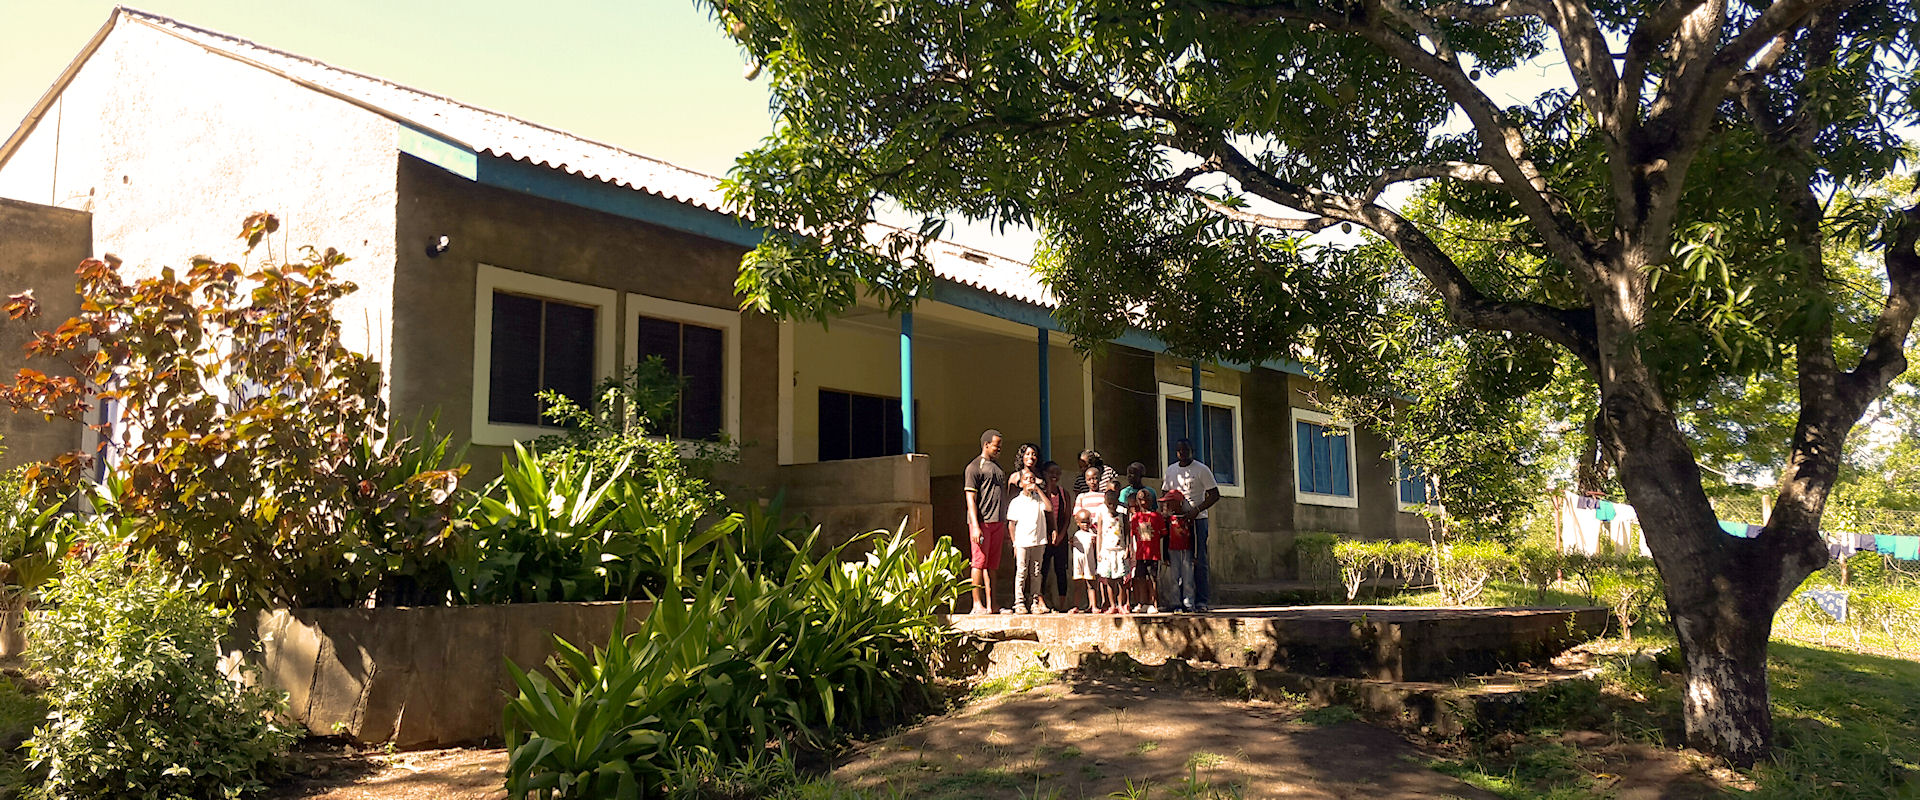 Diani Childrens Village | entree opvanghuis Diani Kenia